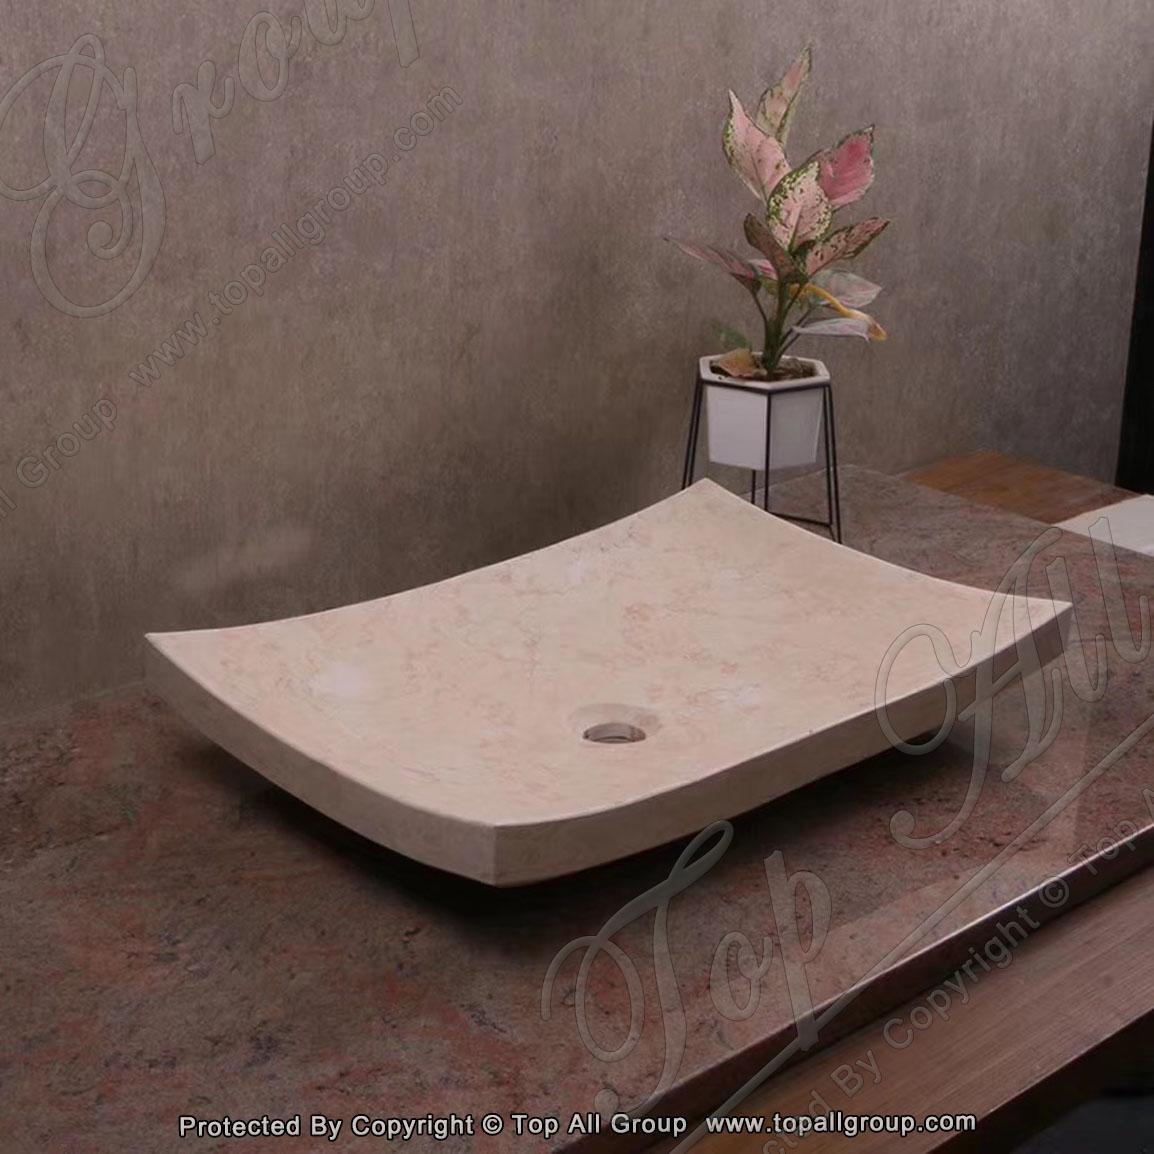 Natural Stone Pedestal Marble Sink for Bathroom